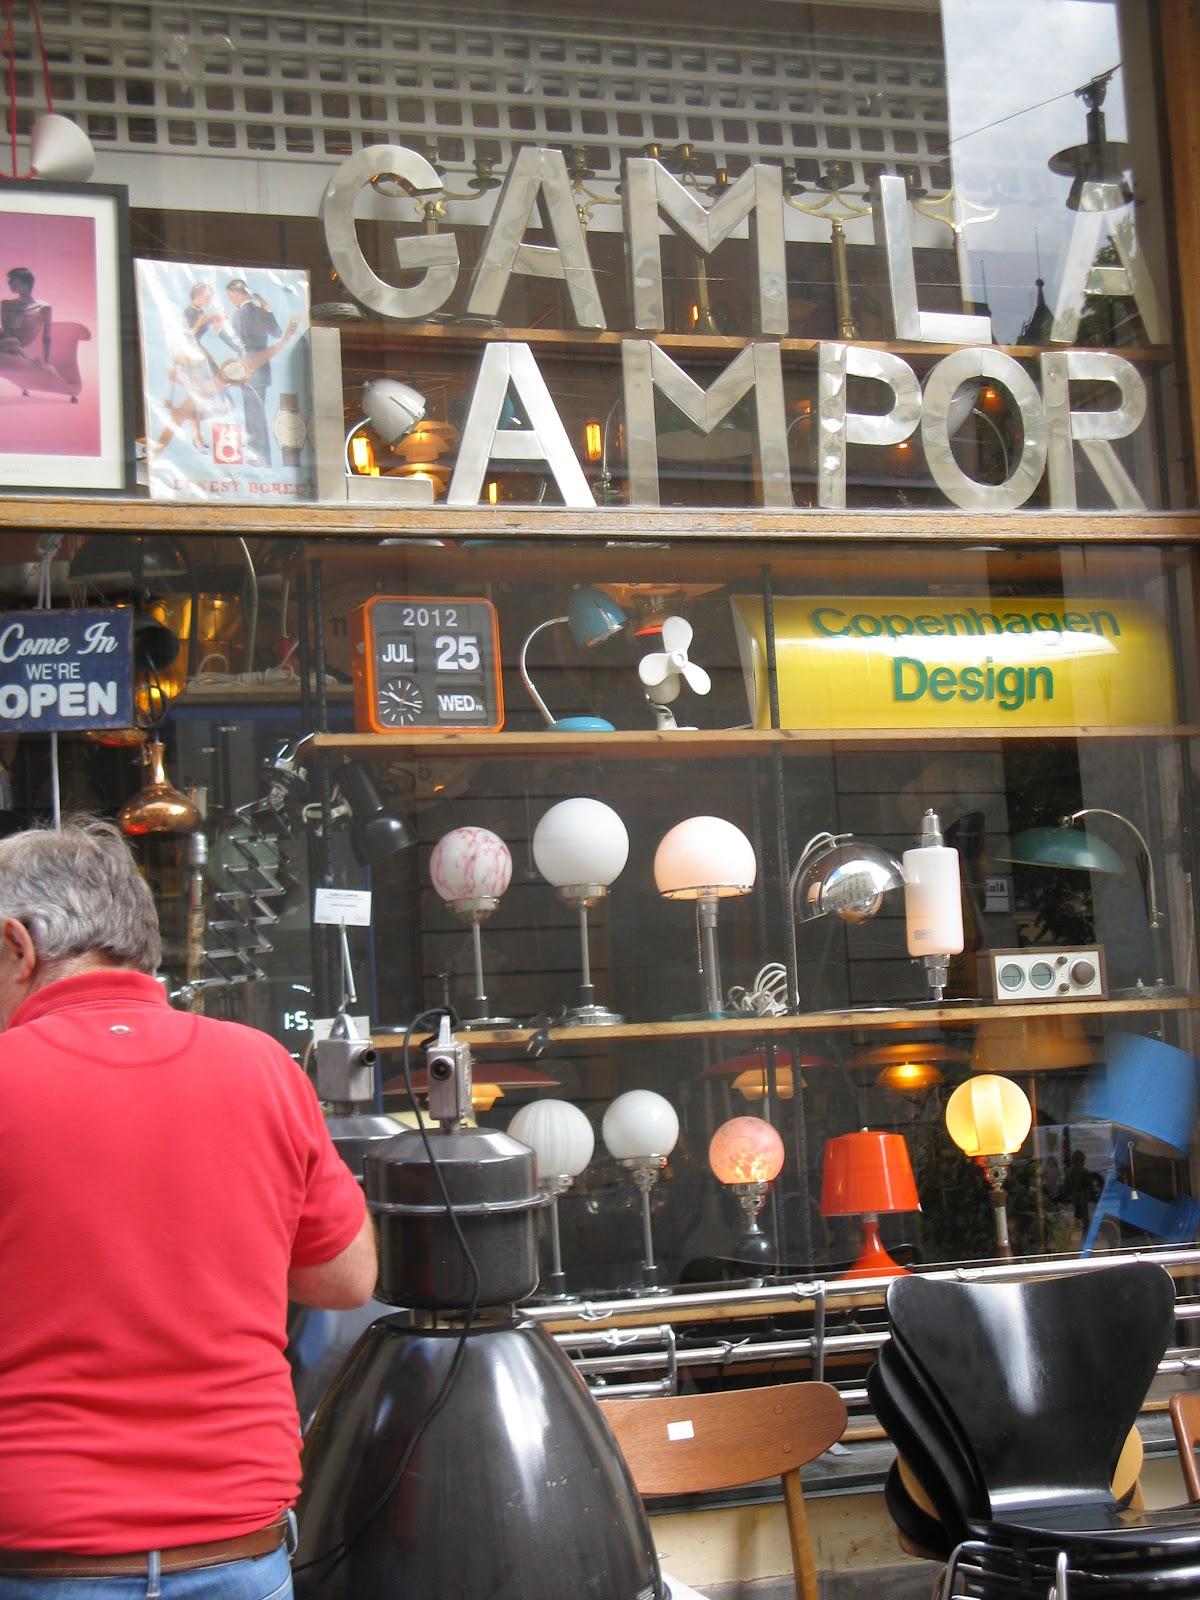 Vintagebutiken.se: Gamla lampor...